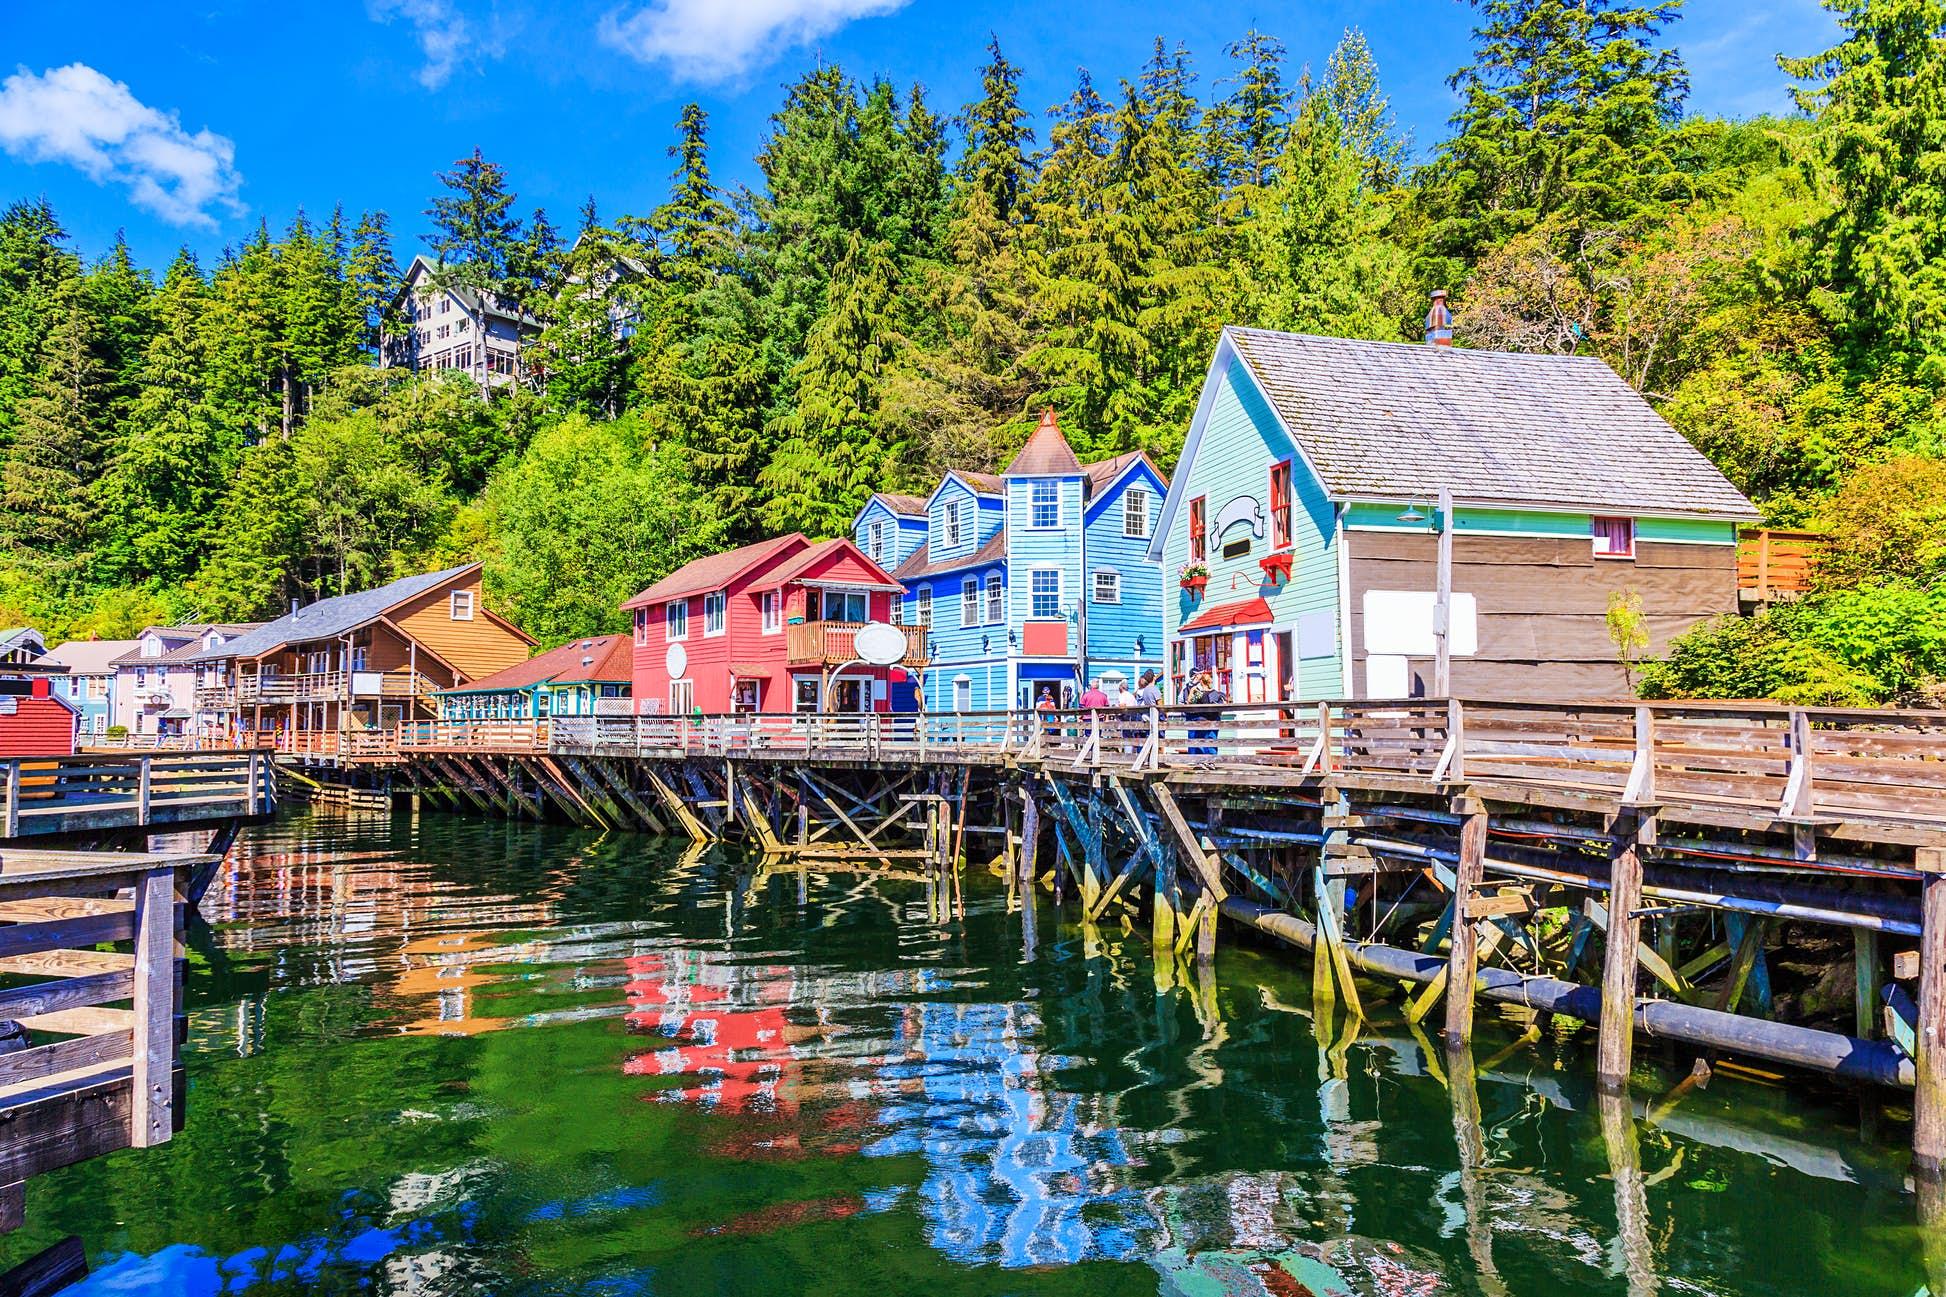 Ketchikan, Alaska © sorincolac / Getty Images